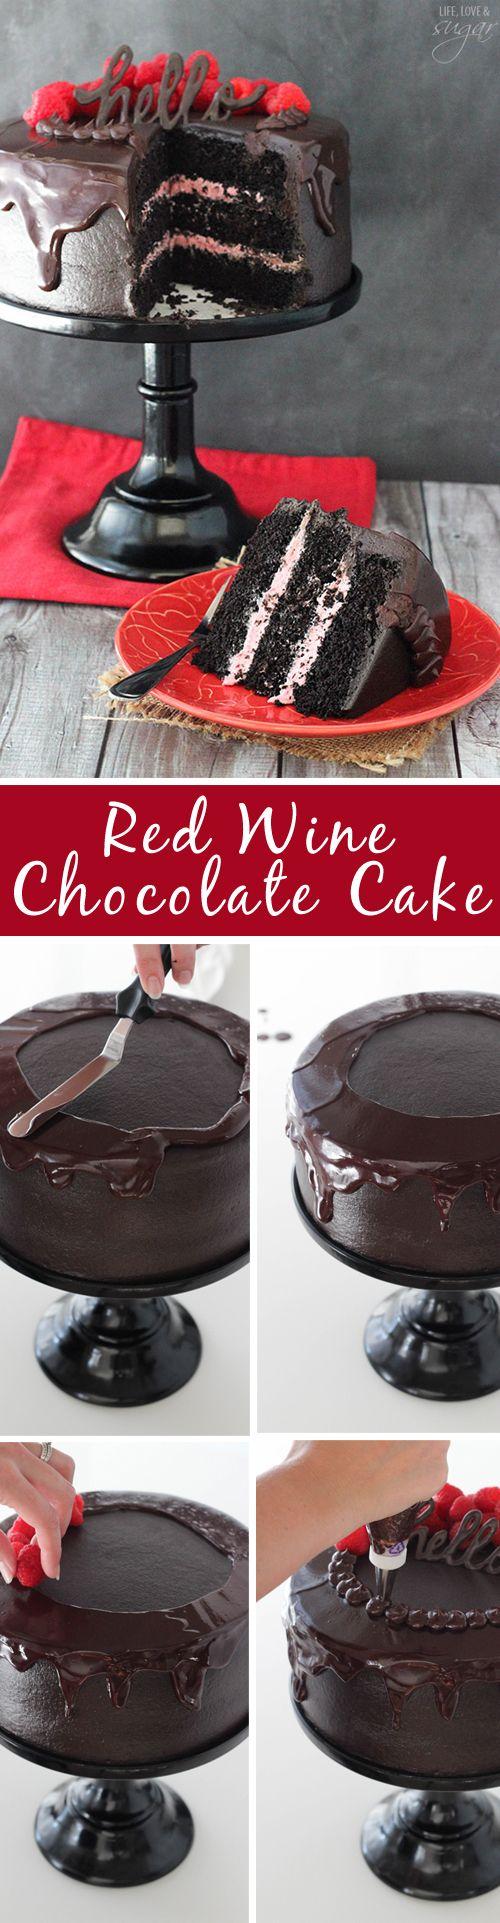 Red Wine Chocolate Cake Receta Pasteles Deliciosos Tortas Receta De Torta